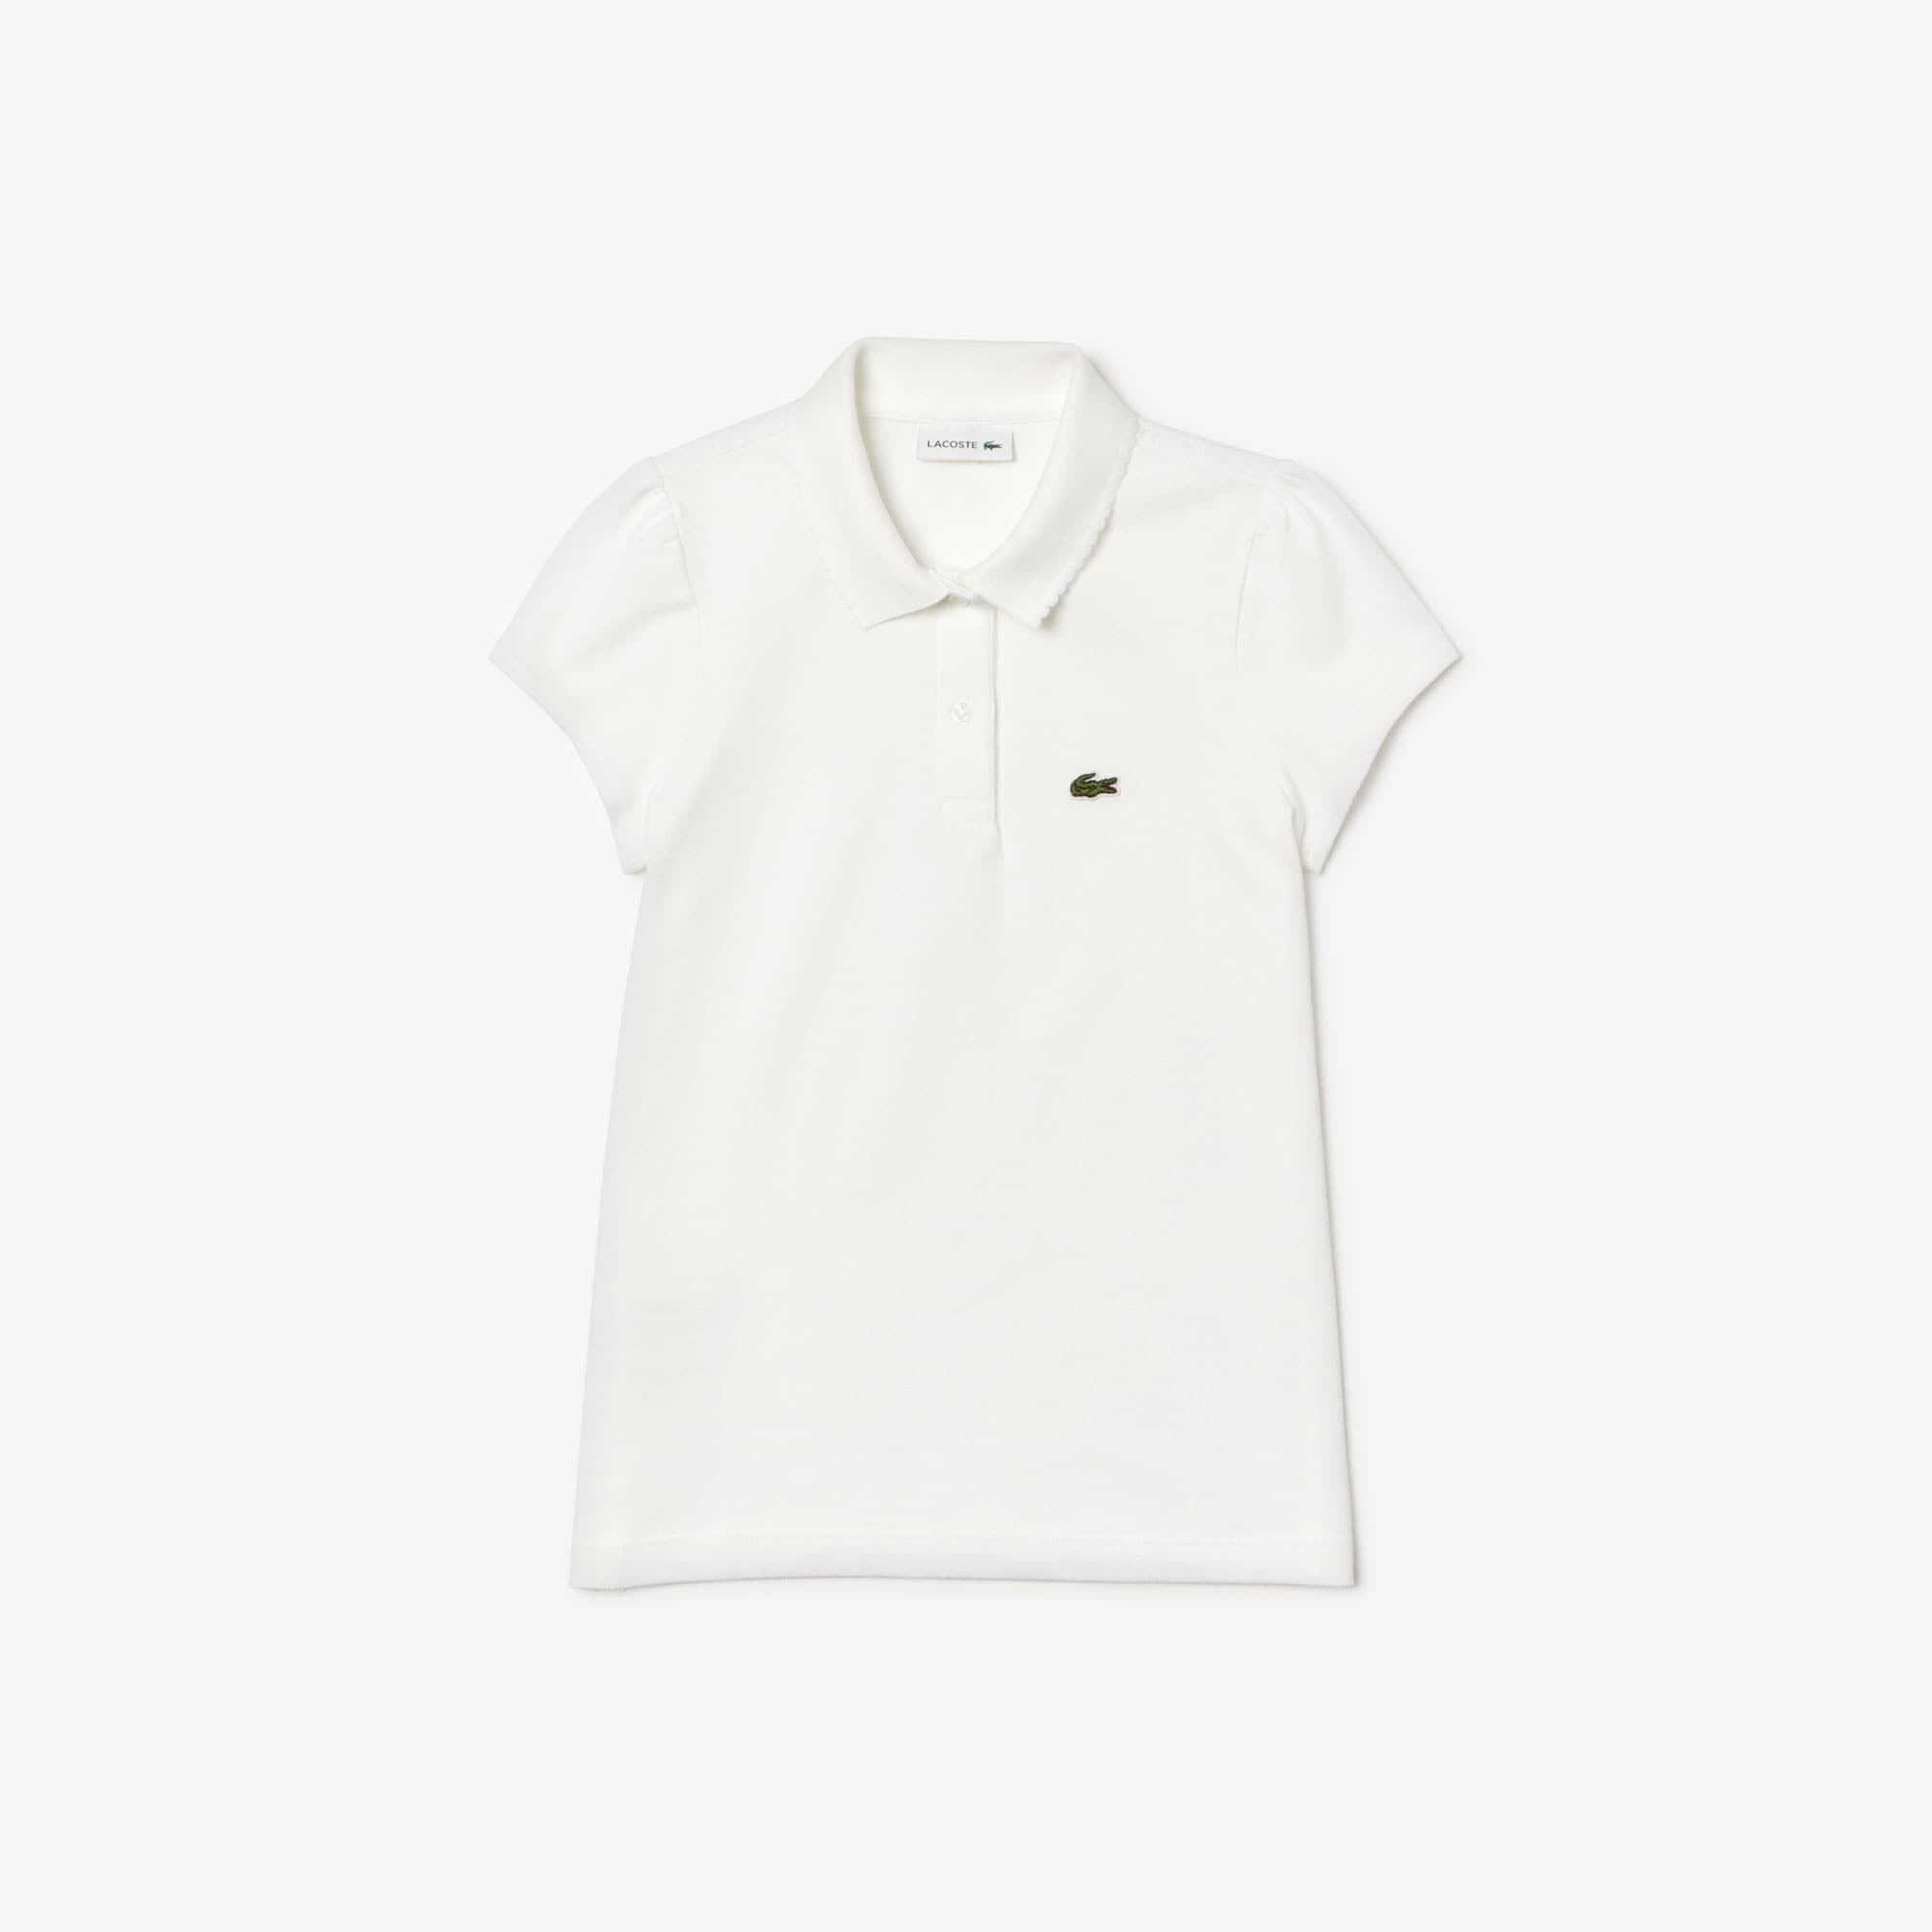 3582547f65 Camisa Polo Lacoste Feminina Infantil em Minipiquet com Gola Recortada